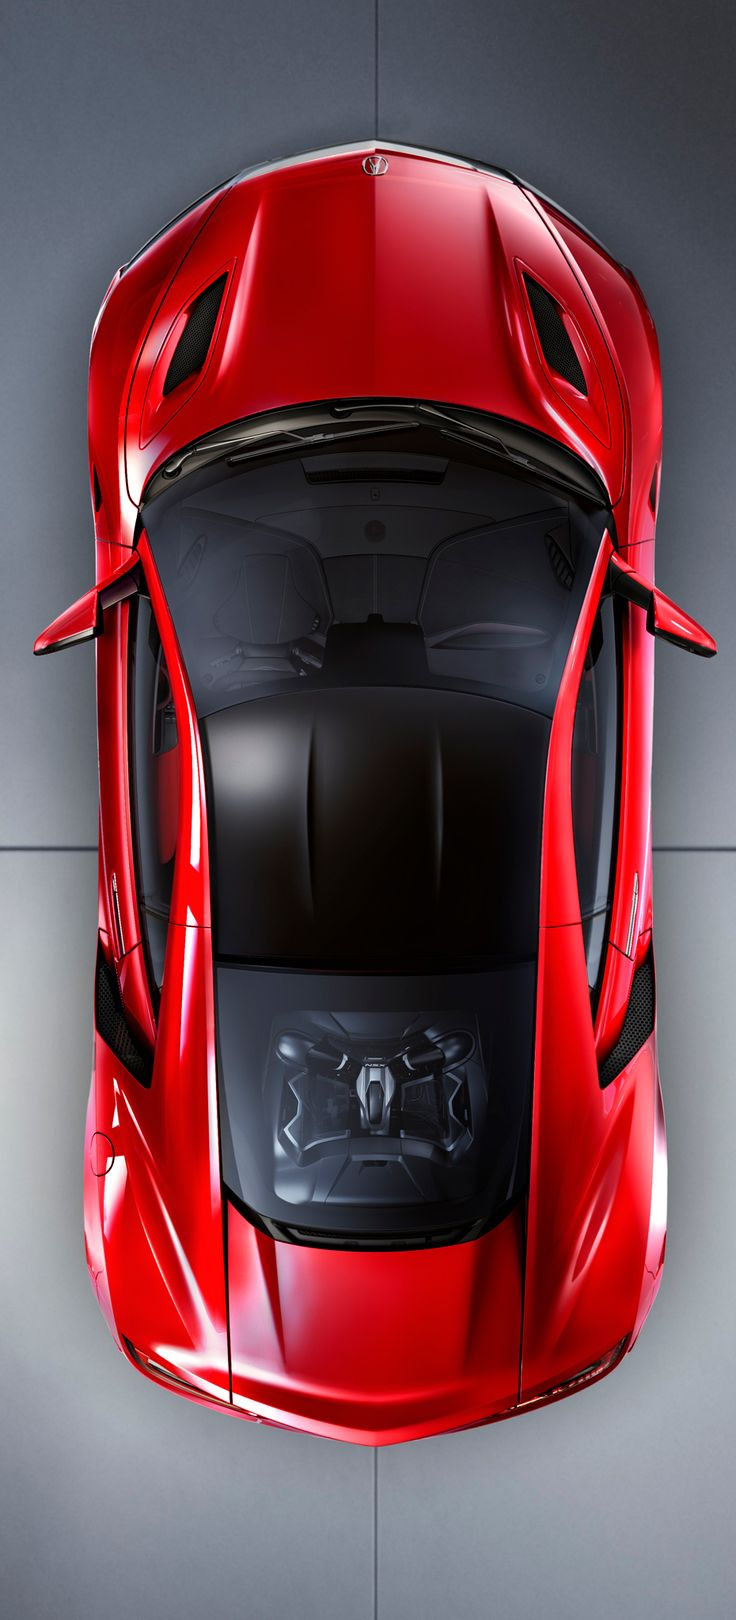 Best 25 honda nsx 2015 ideas on pinterest cool cars ferrari laferrari and honda